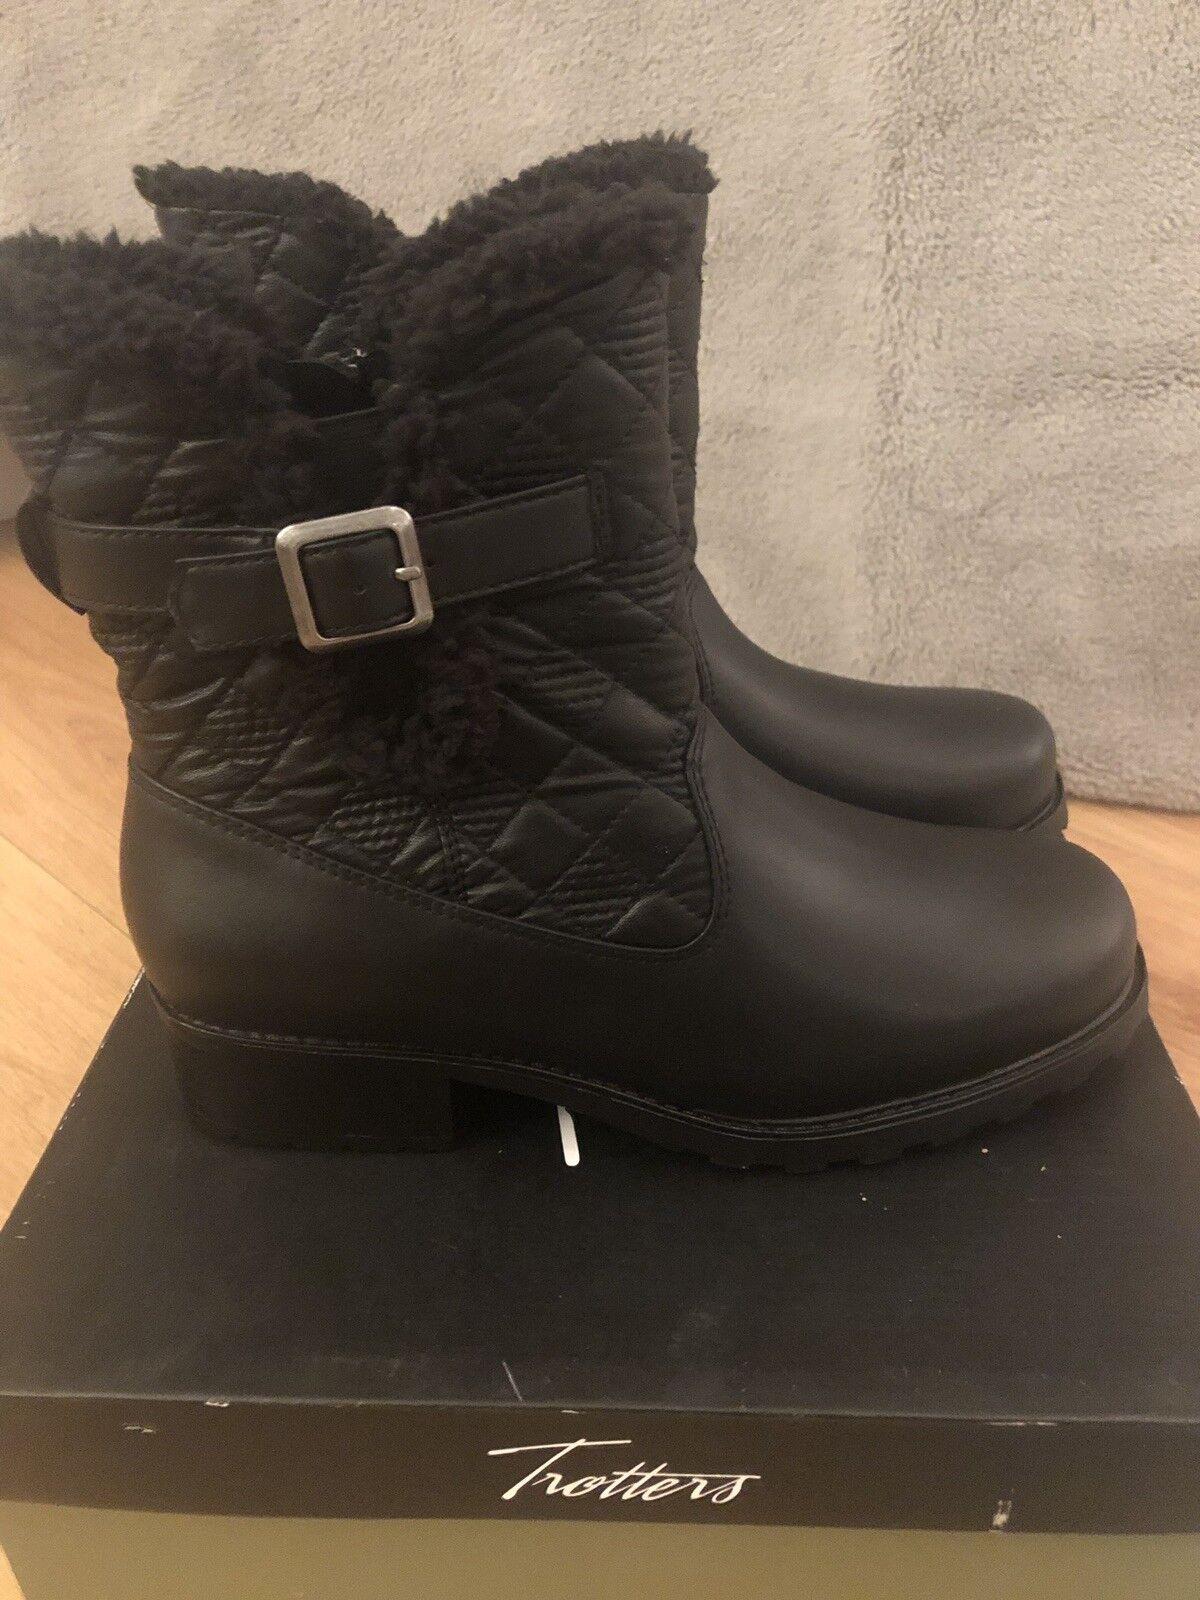 NARROW TredTERS BLAST III ladies fleece lined ankle boot-black leather UK 6 N